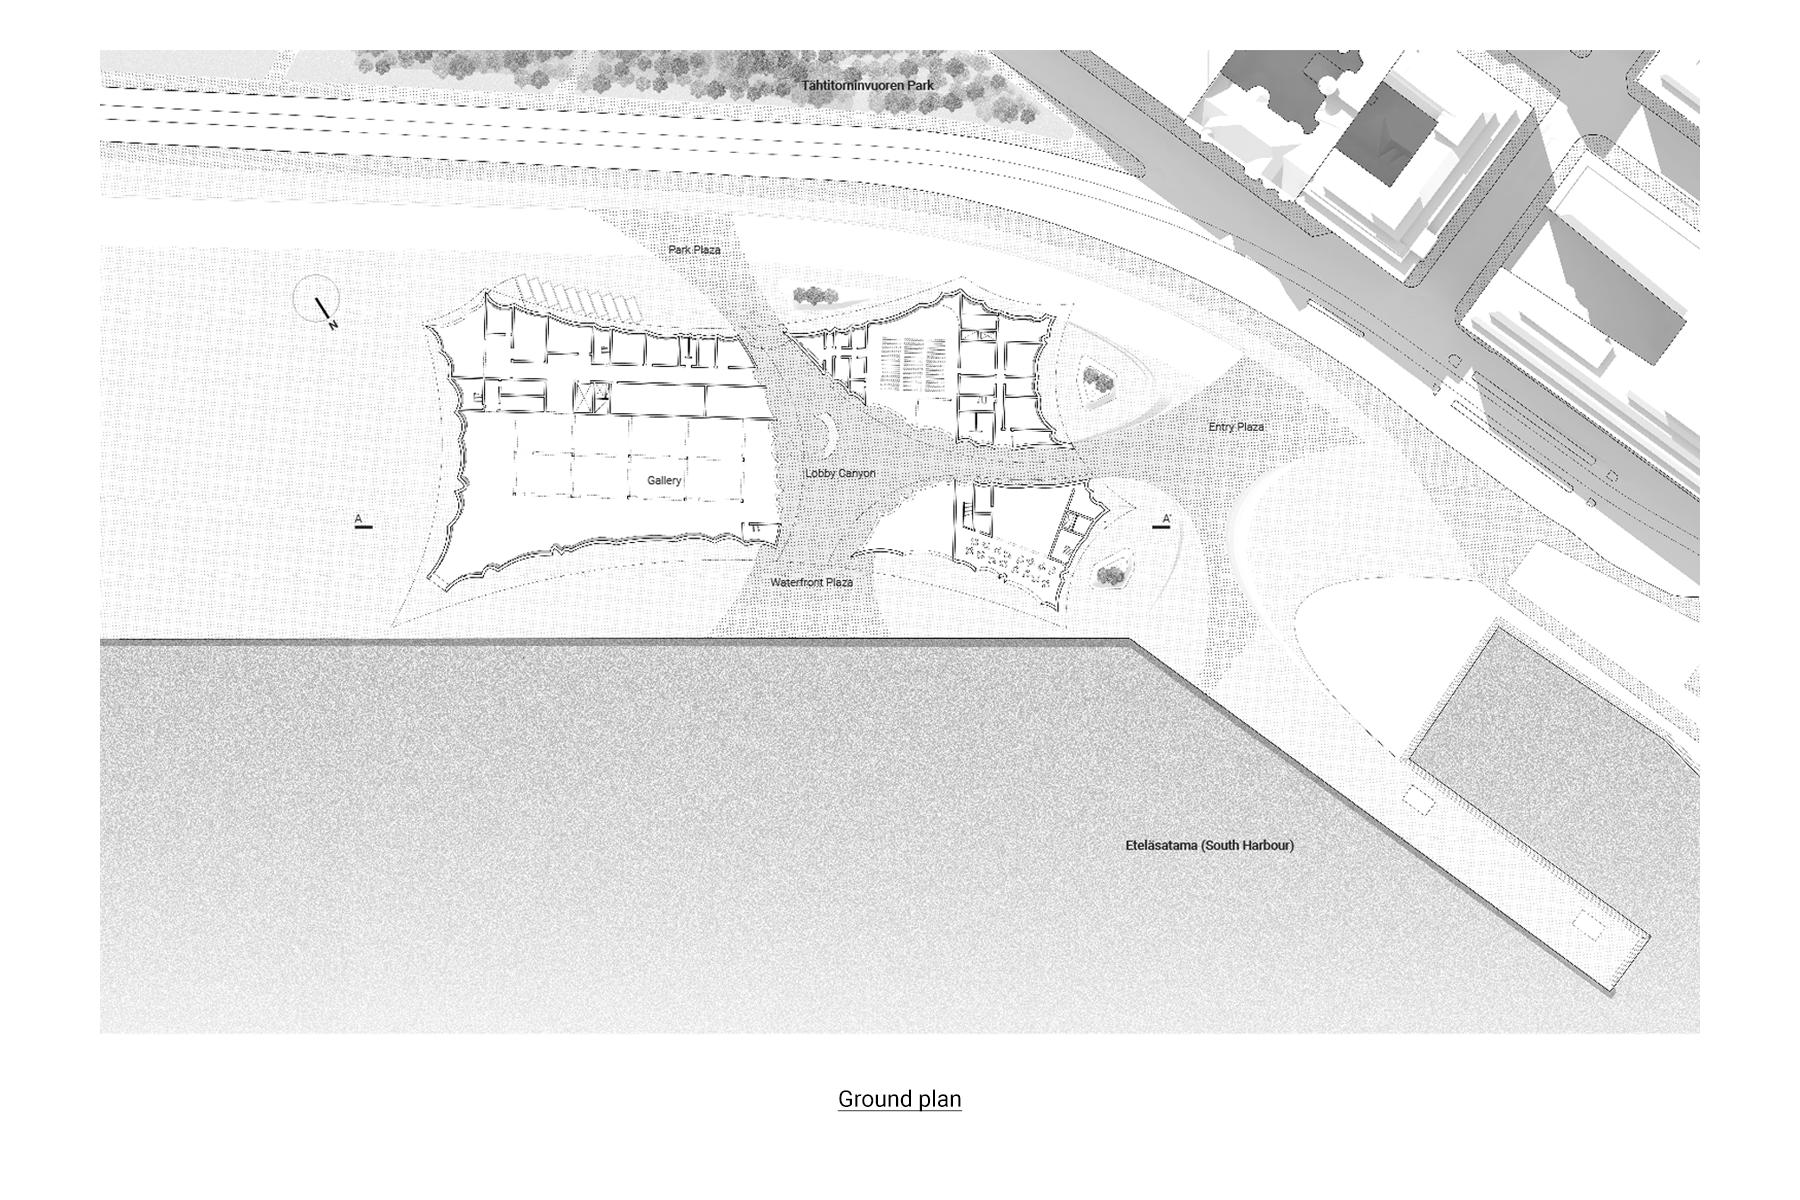 ground-plan_tex.png